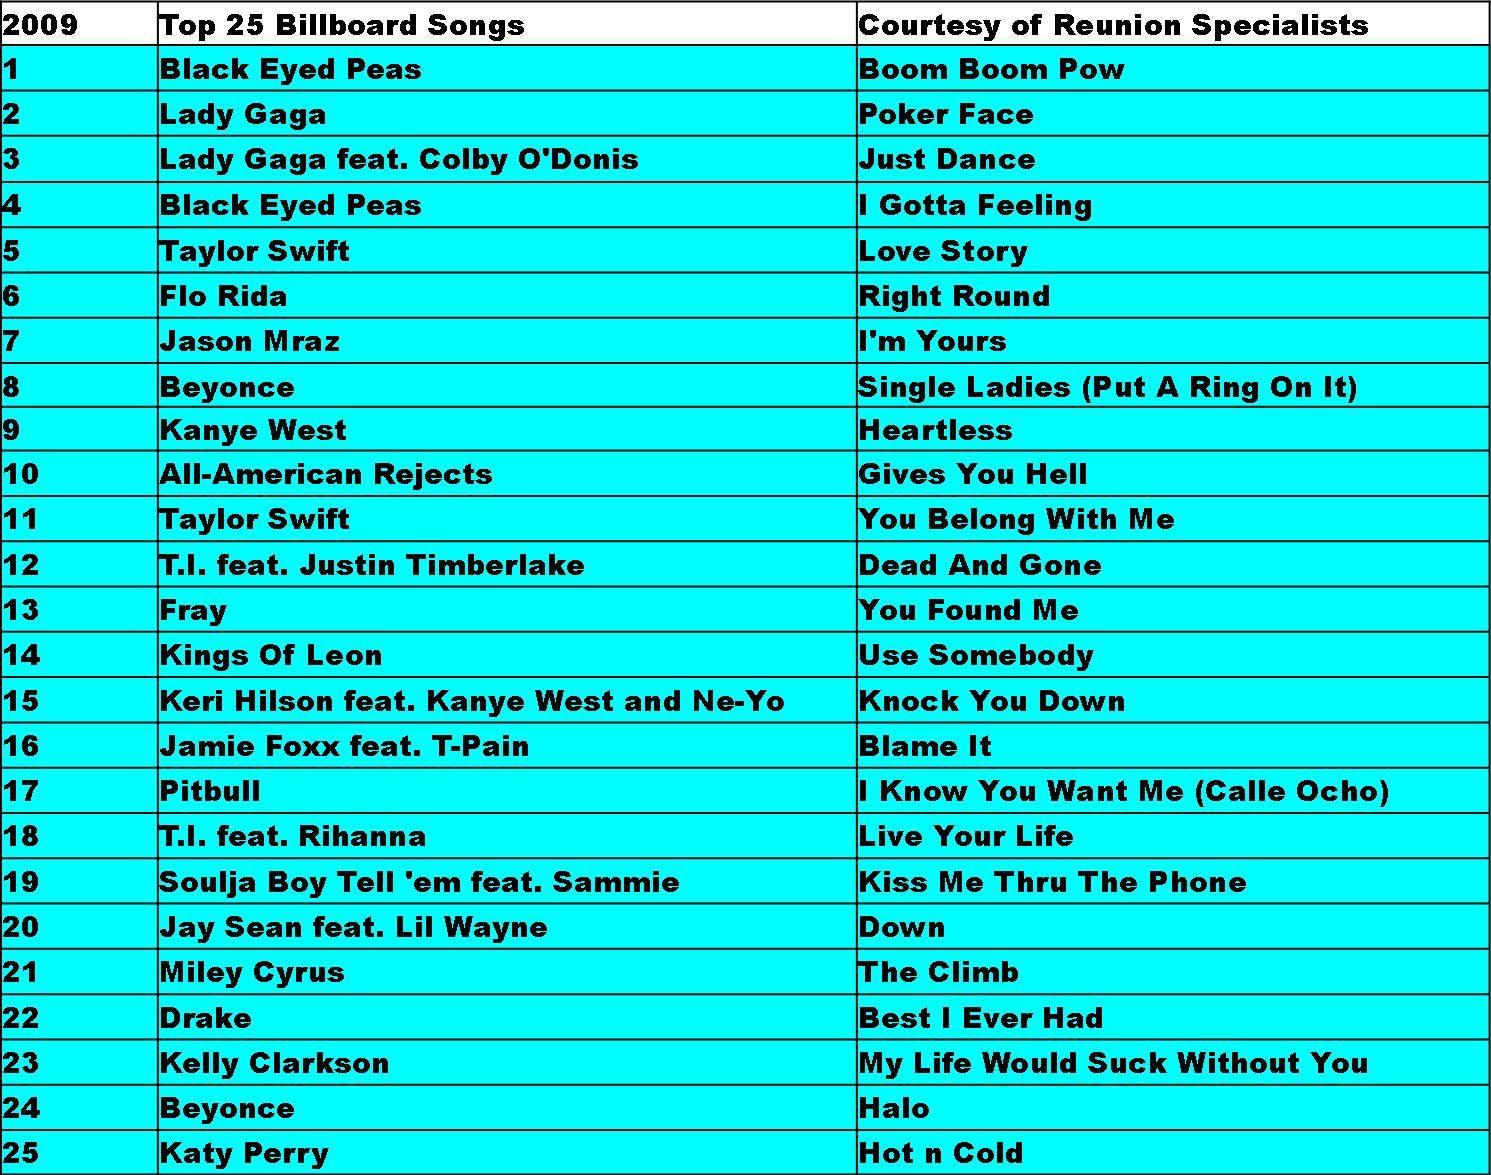 2009 Top 25 Billboard Hits Billboard Hits Throwback Songs Billboard Songs